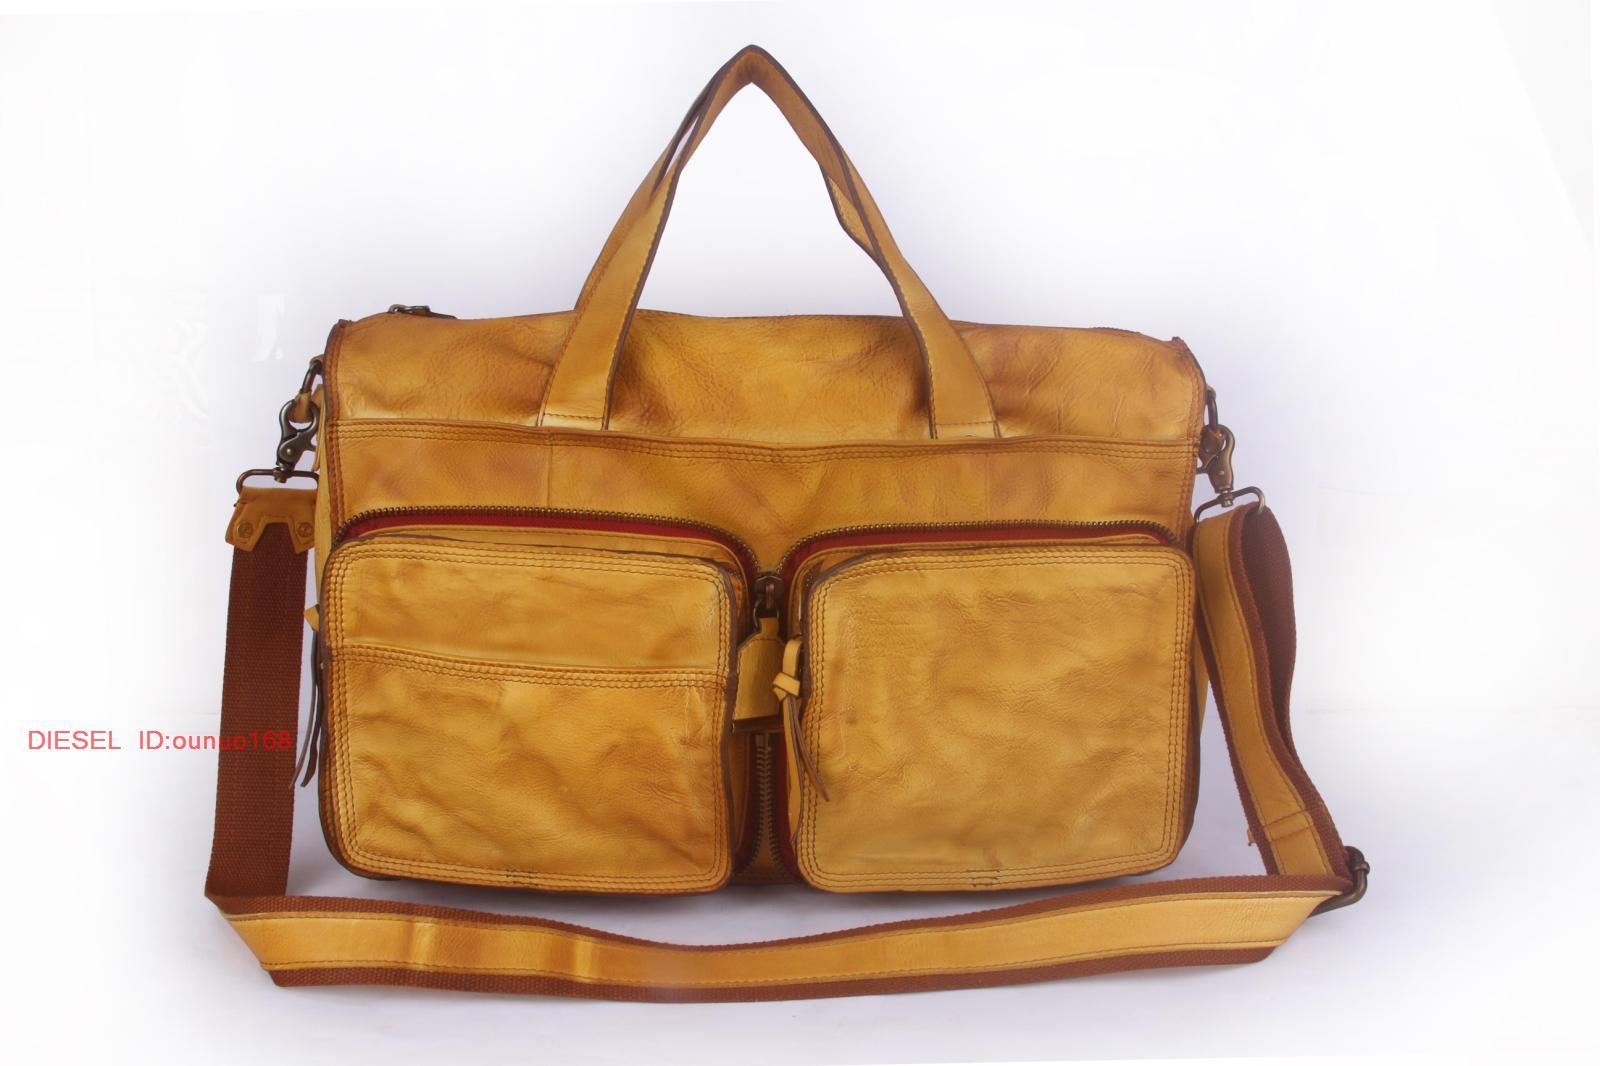 Сумка Diesel 60309 Die&sel/2012 сумочка с ремешком однотонный цвет кожа быка